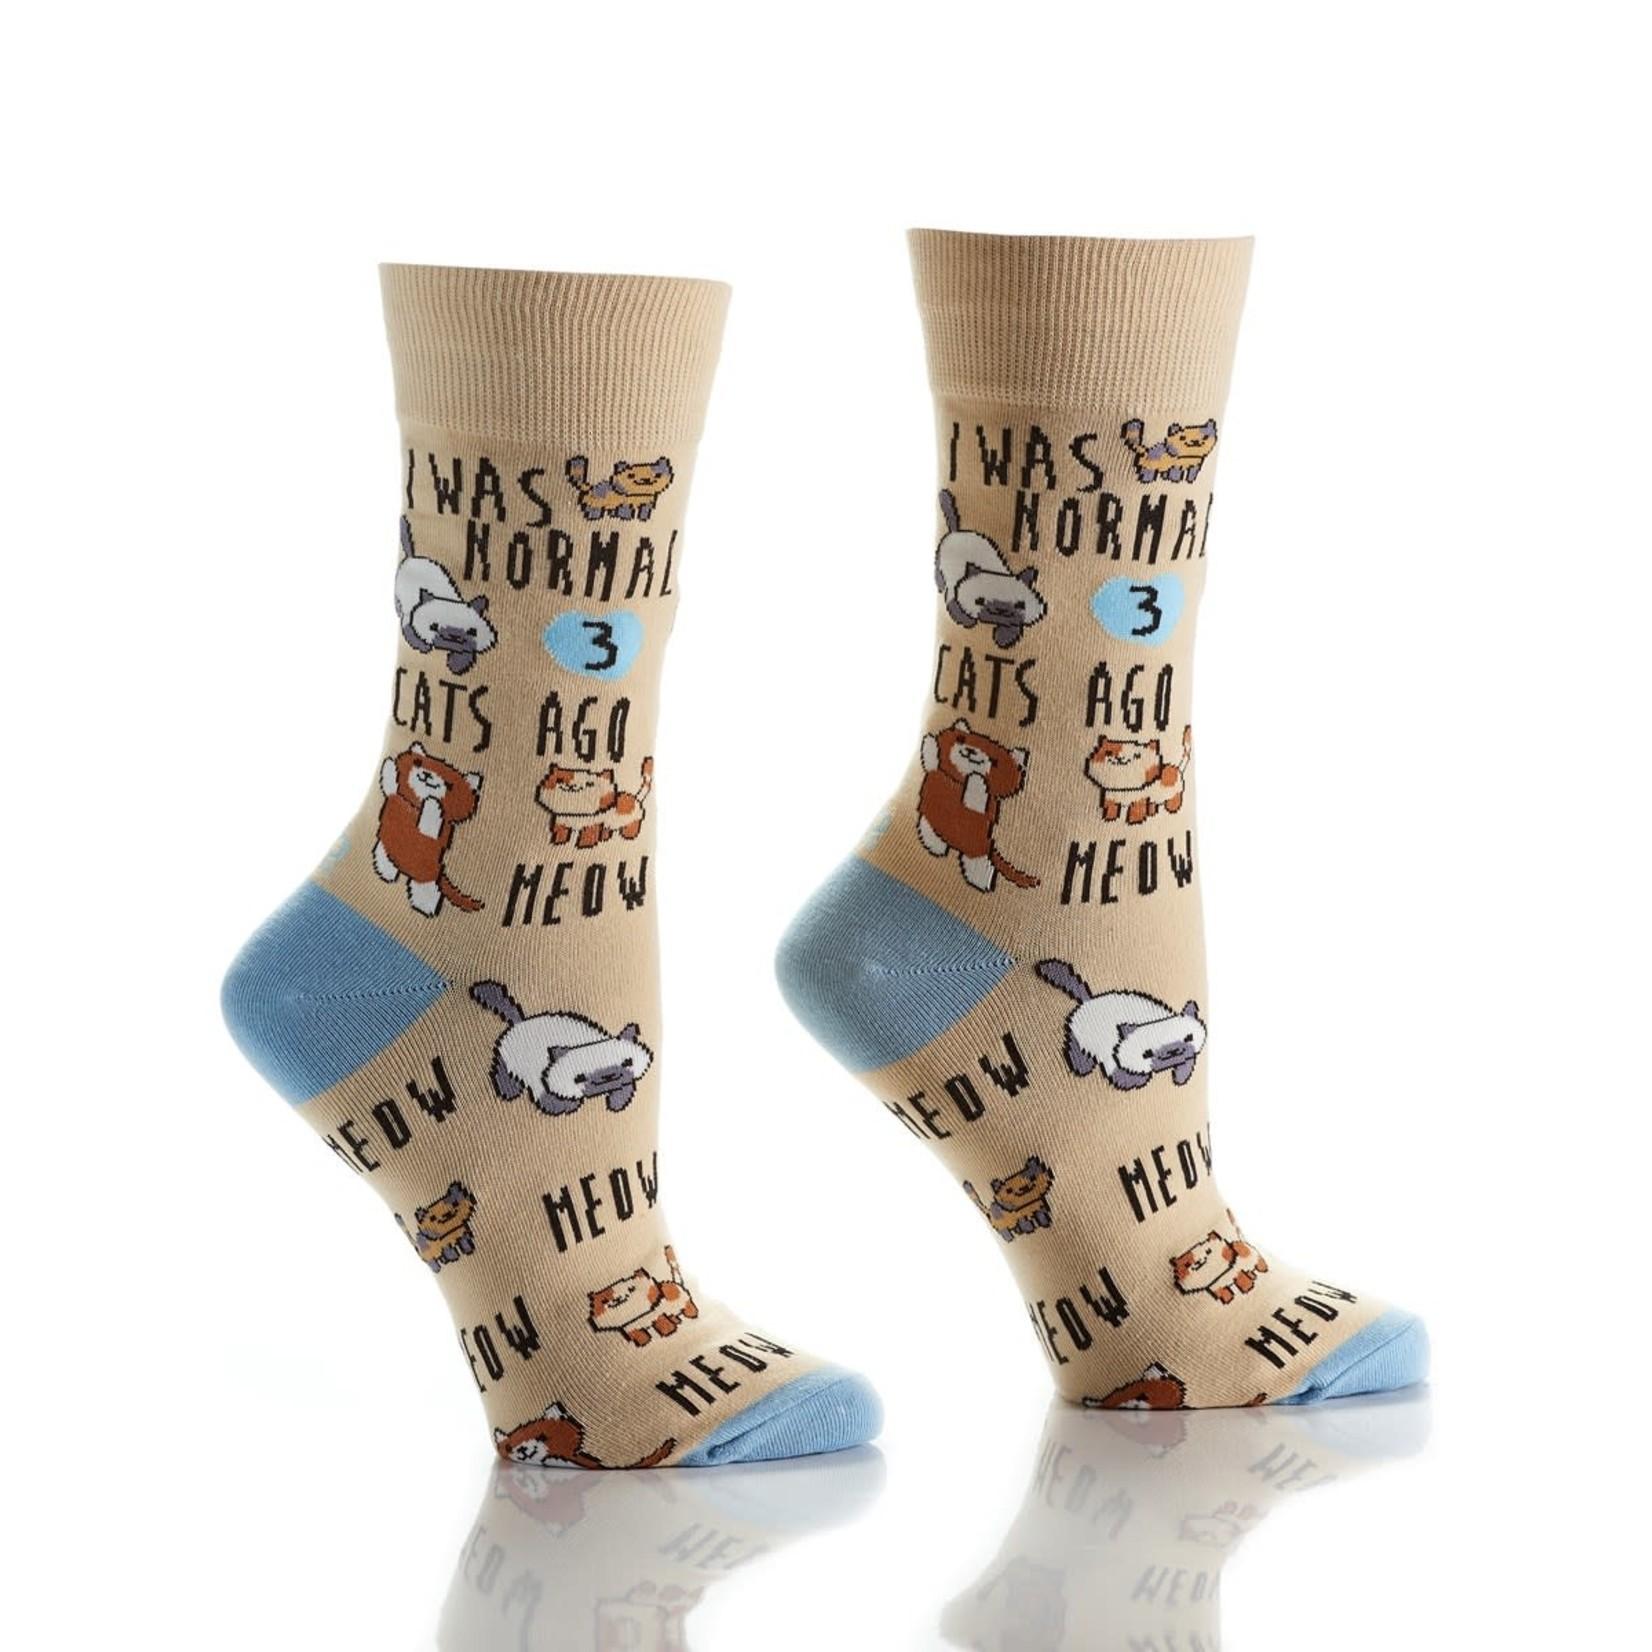 Meow Cats Women's Crew Socks